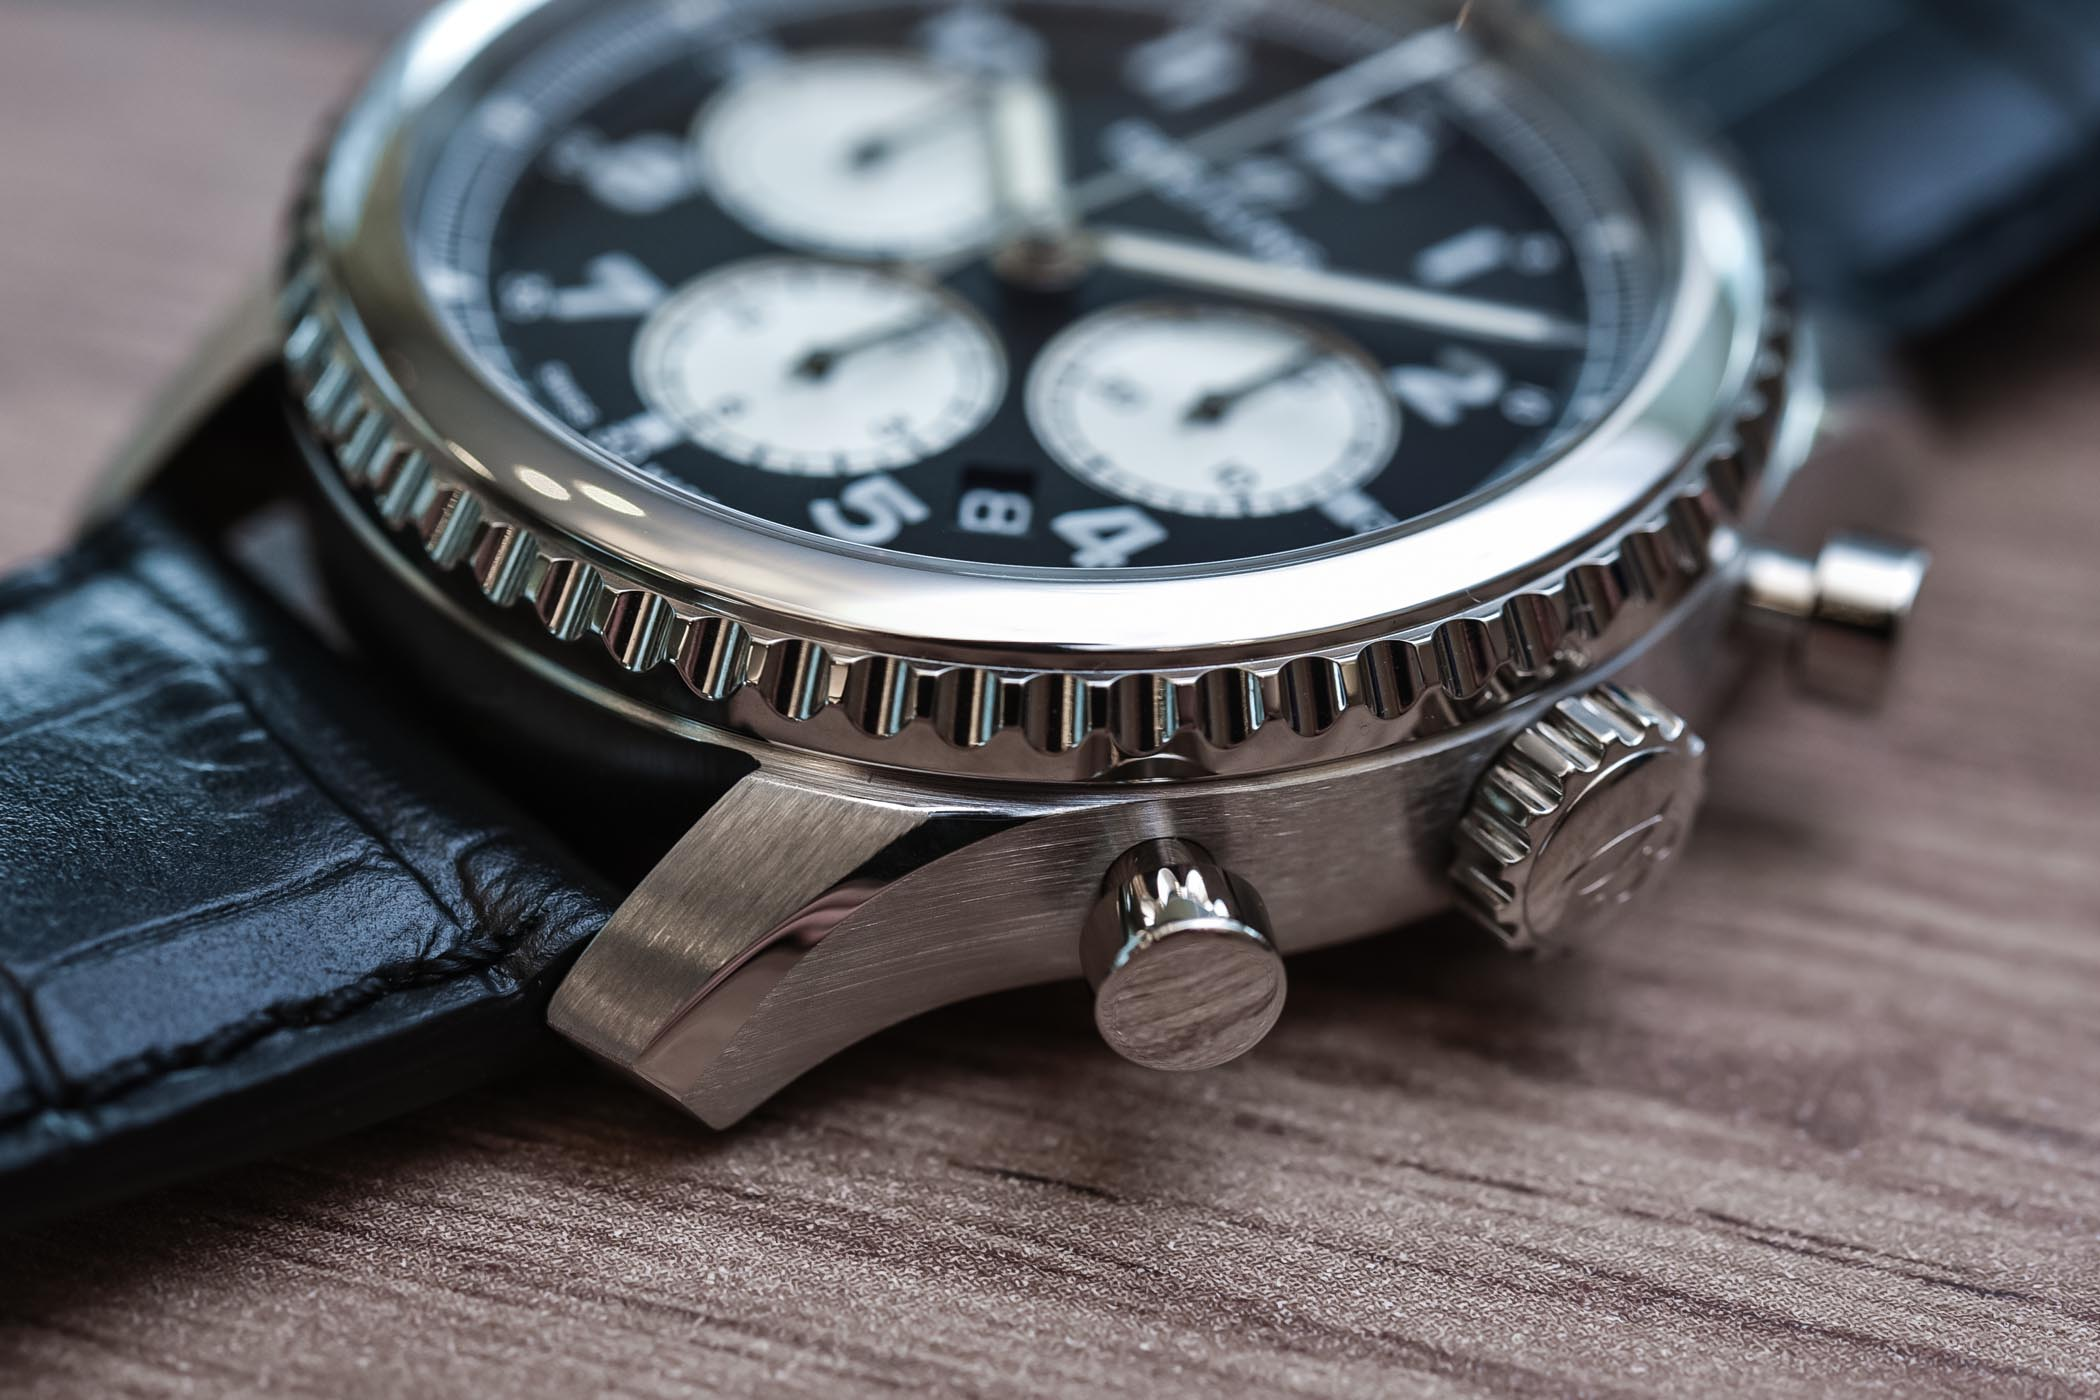 Breitling Navitimer 8 B01 - Review